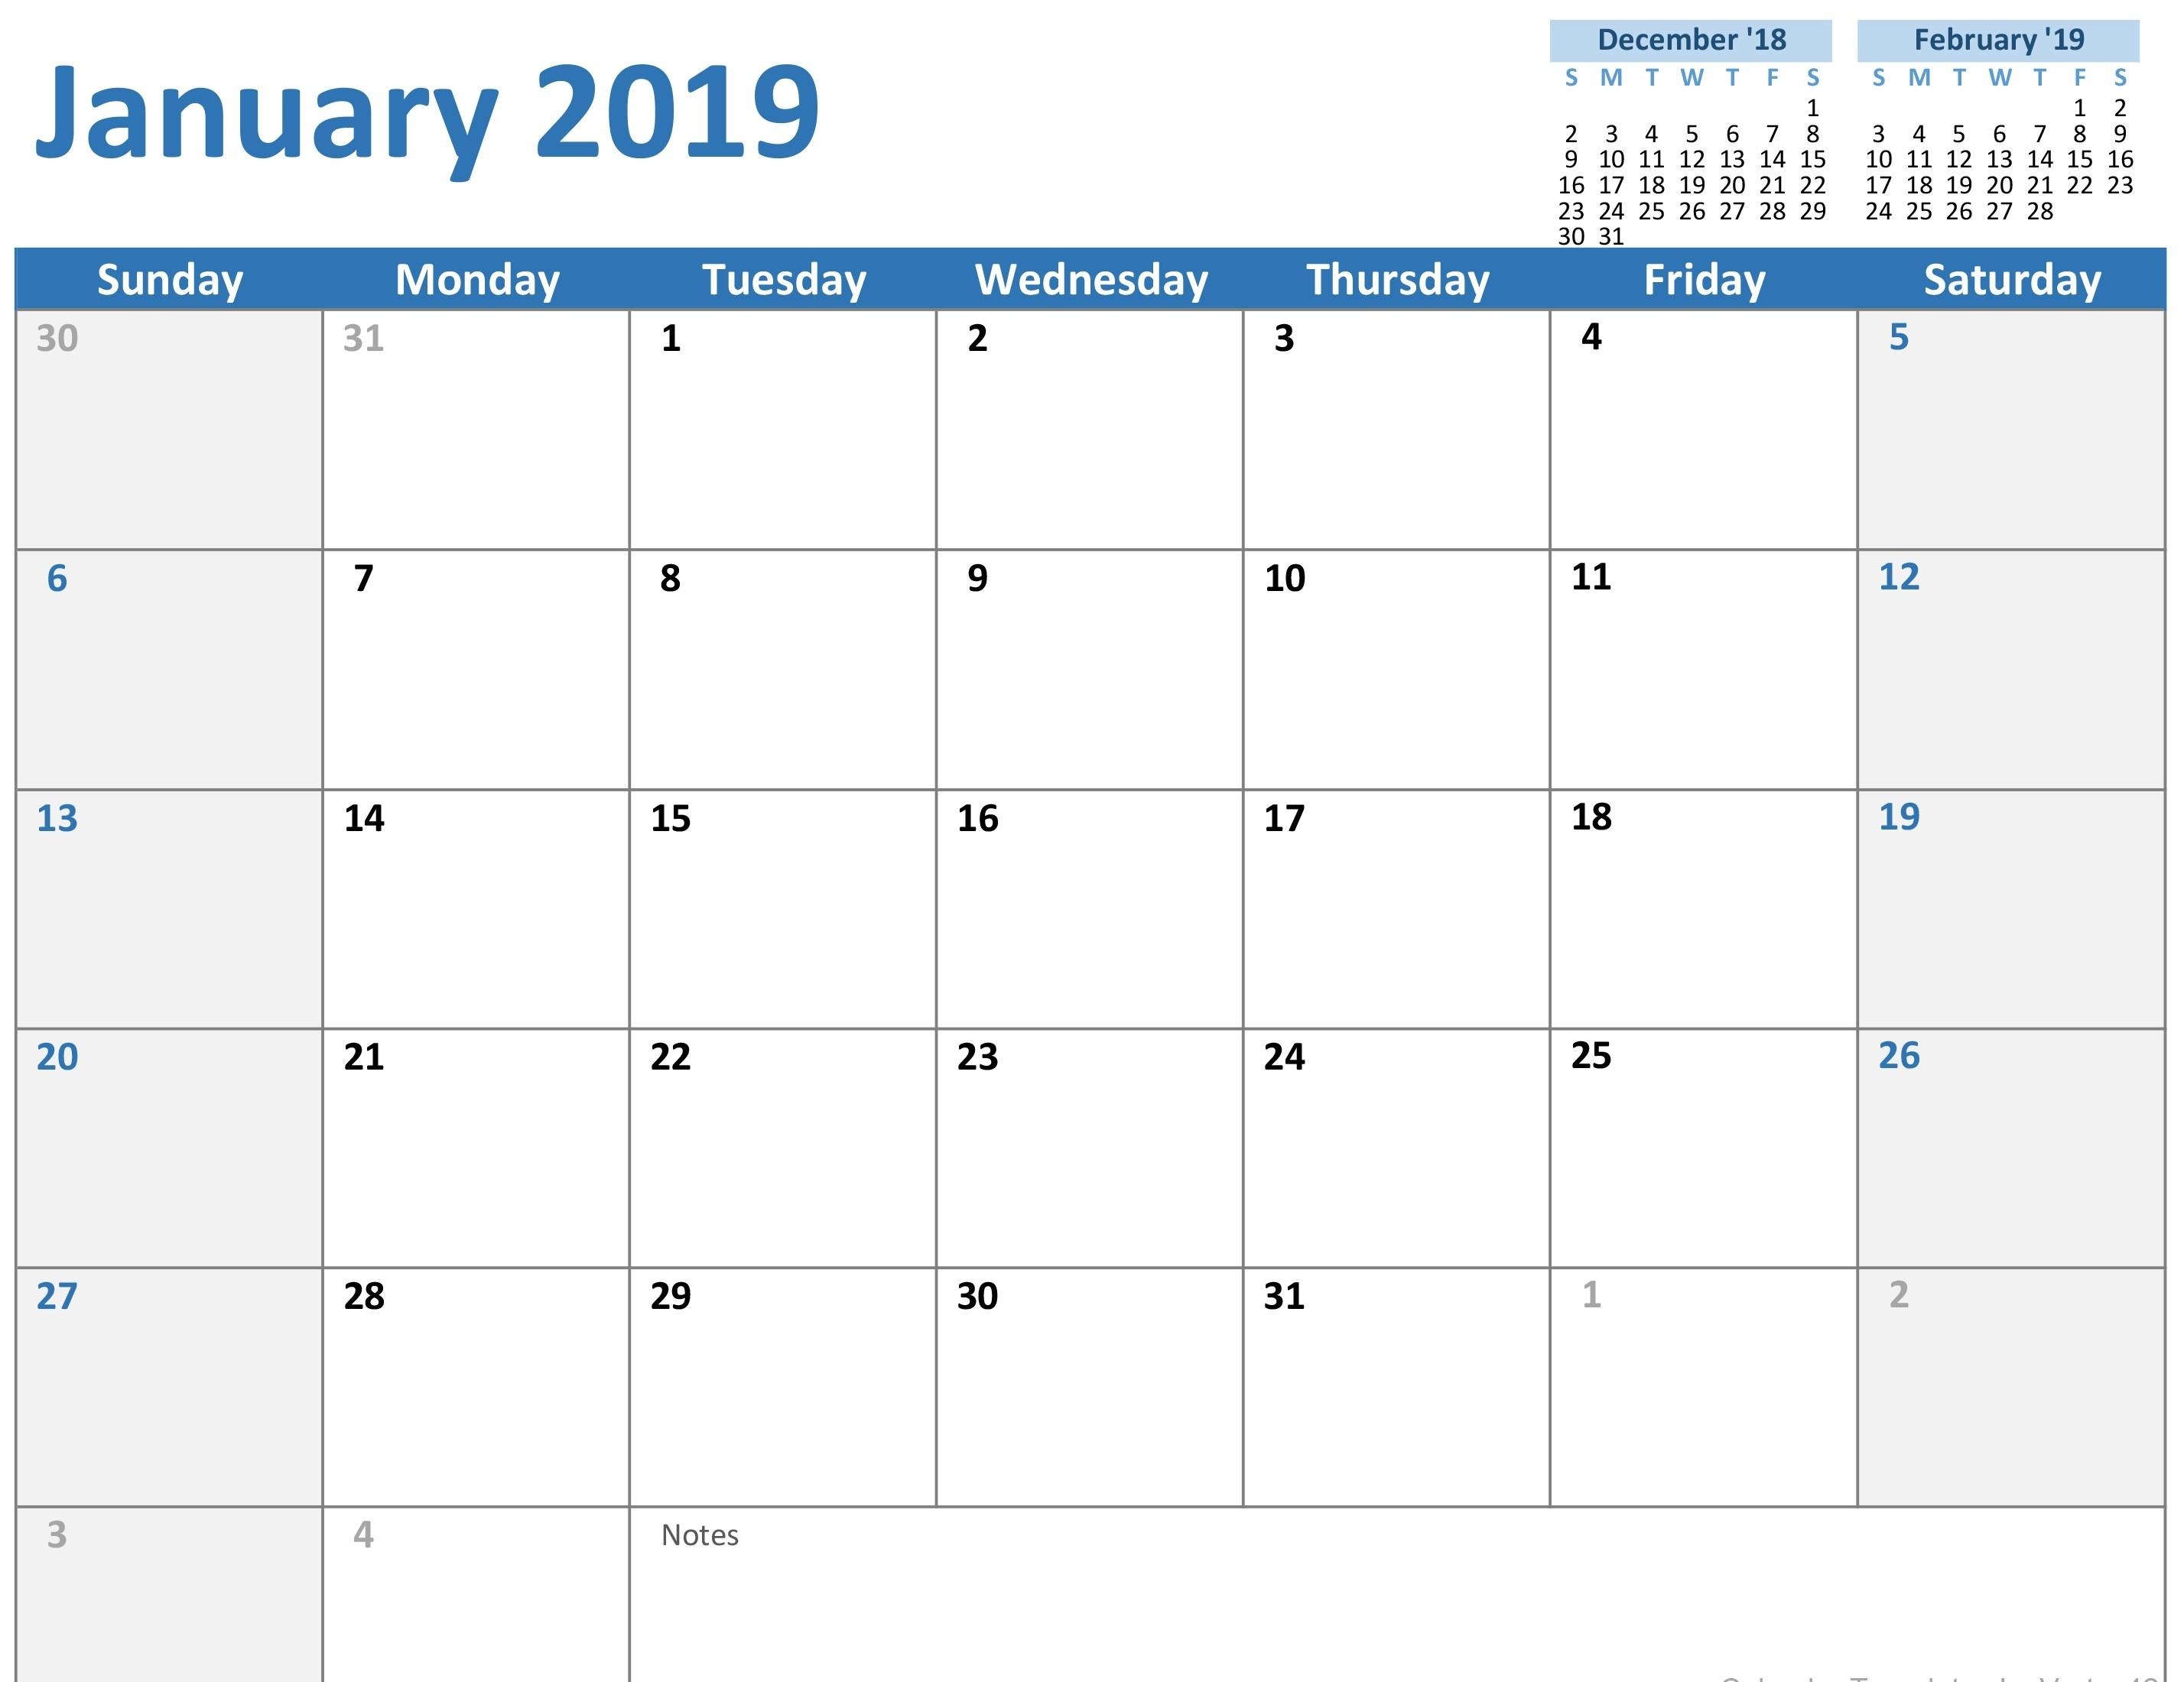 Any Year Custom Calendar pertaining to Basic Monthly Calendar For Editing